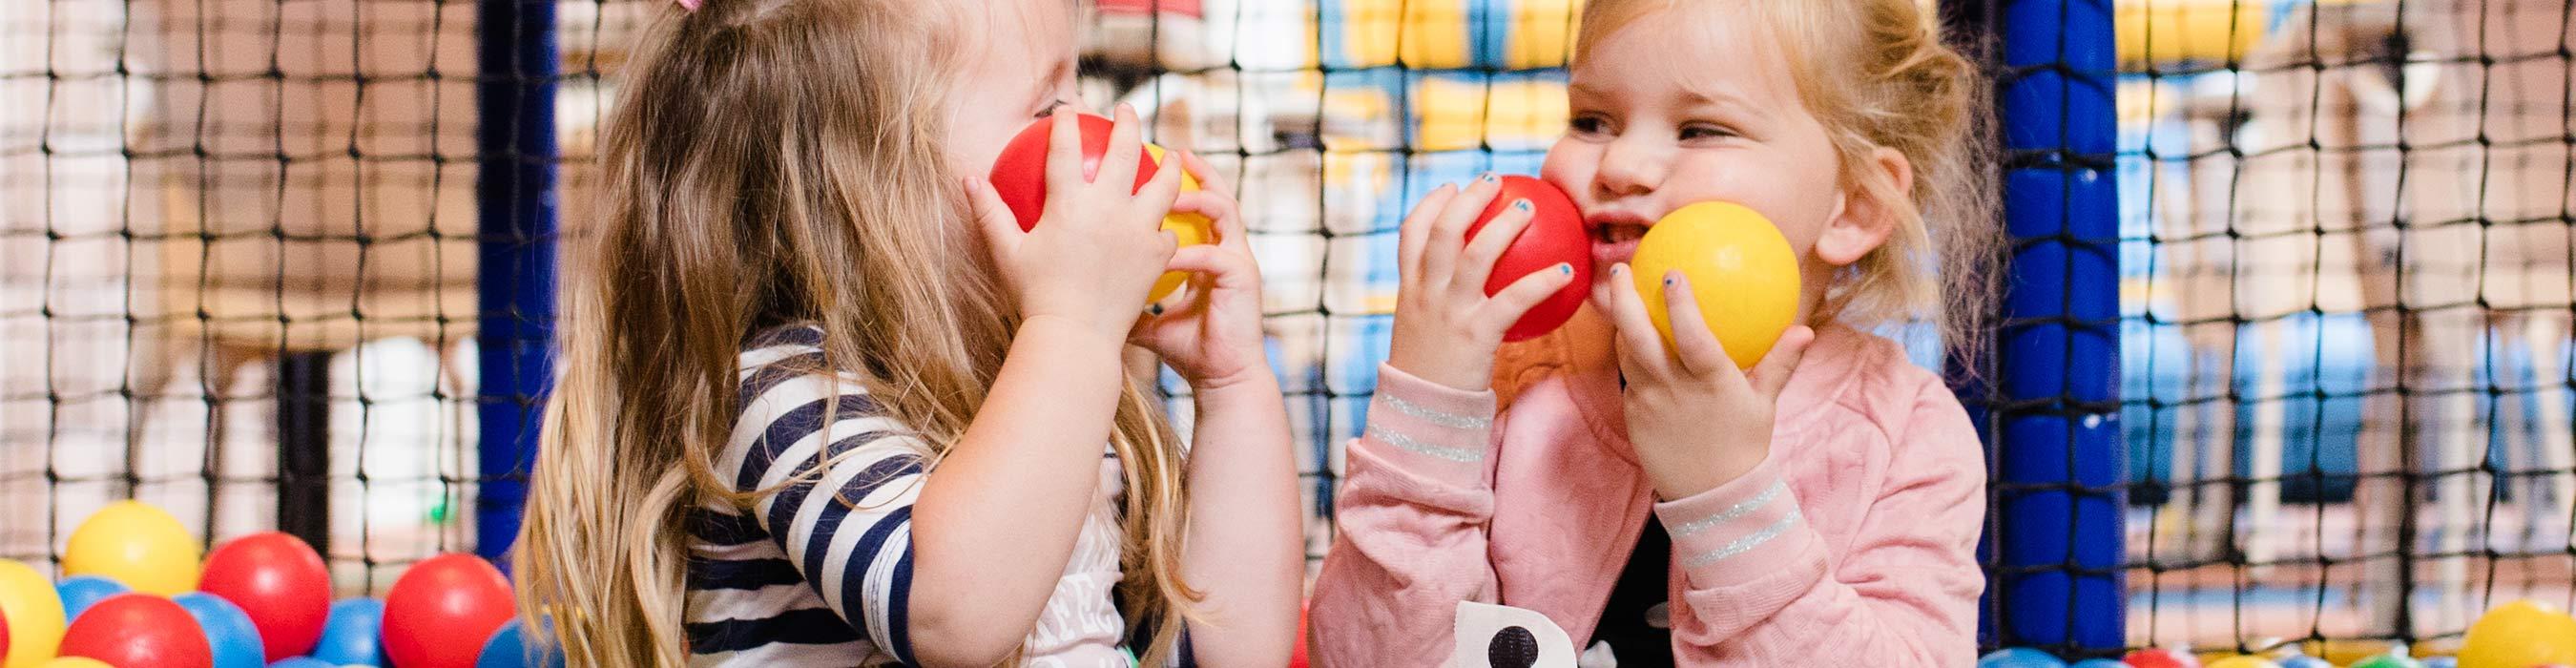 Afbeelding 2 - Kids Castle - Kinderspeelparadijs